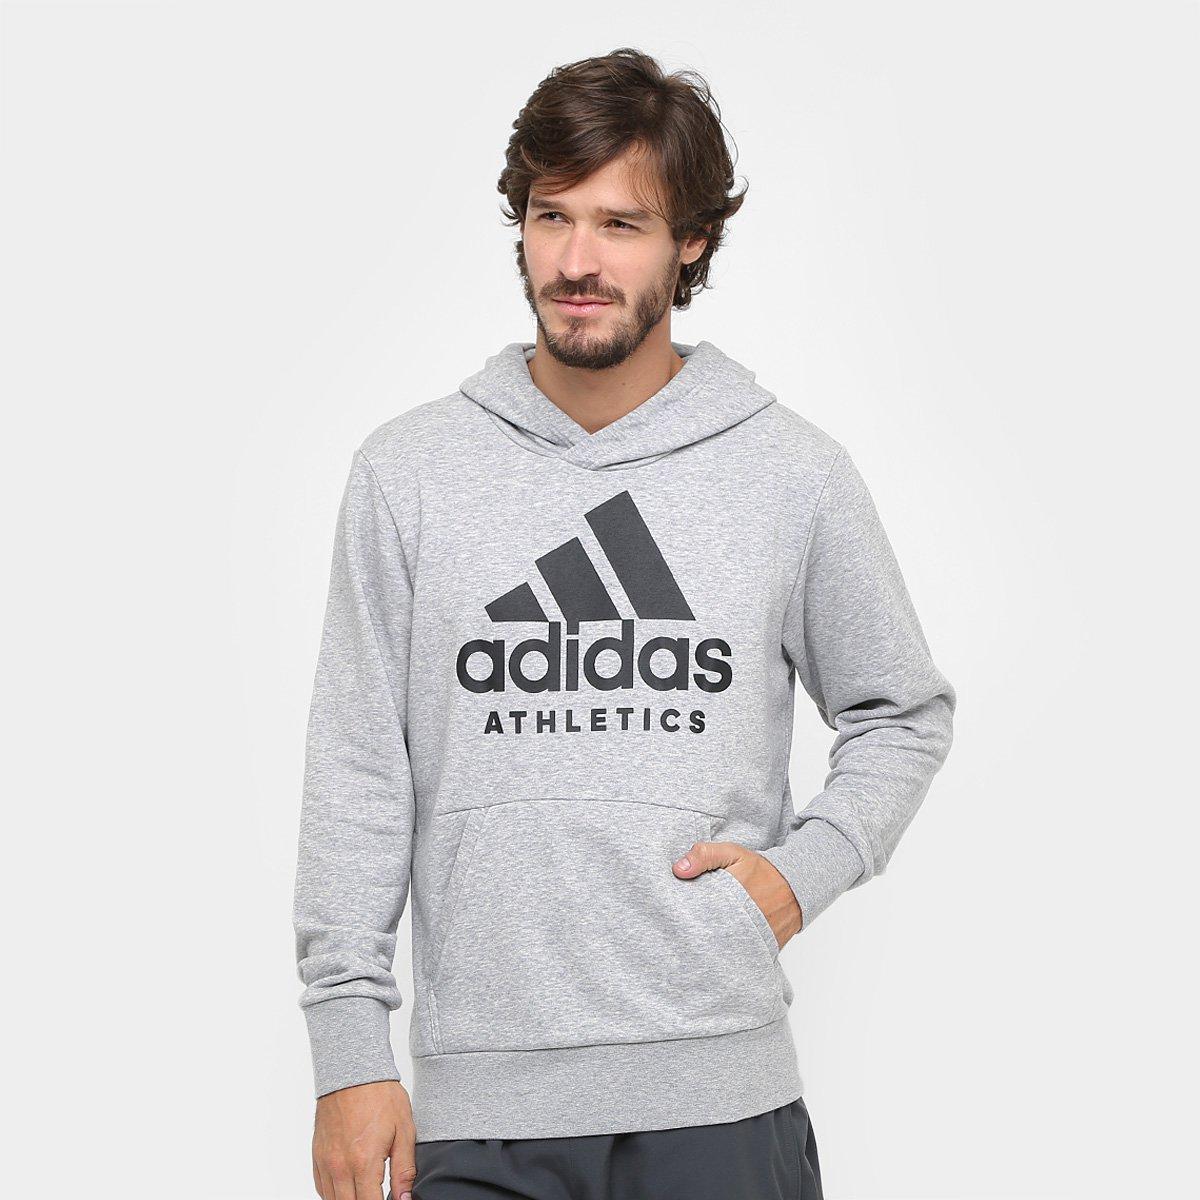 a4a65a9bf07 Moletom Adidas Sport Id Branded Pullover French Terry C  Capuz Masculino -  Compre Agora